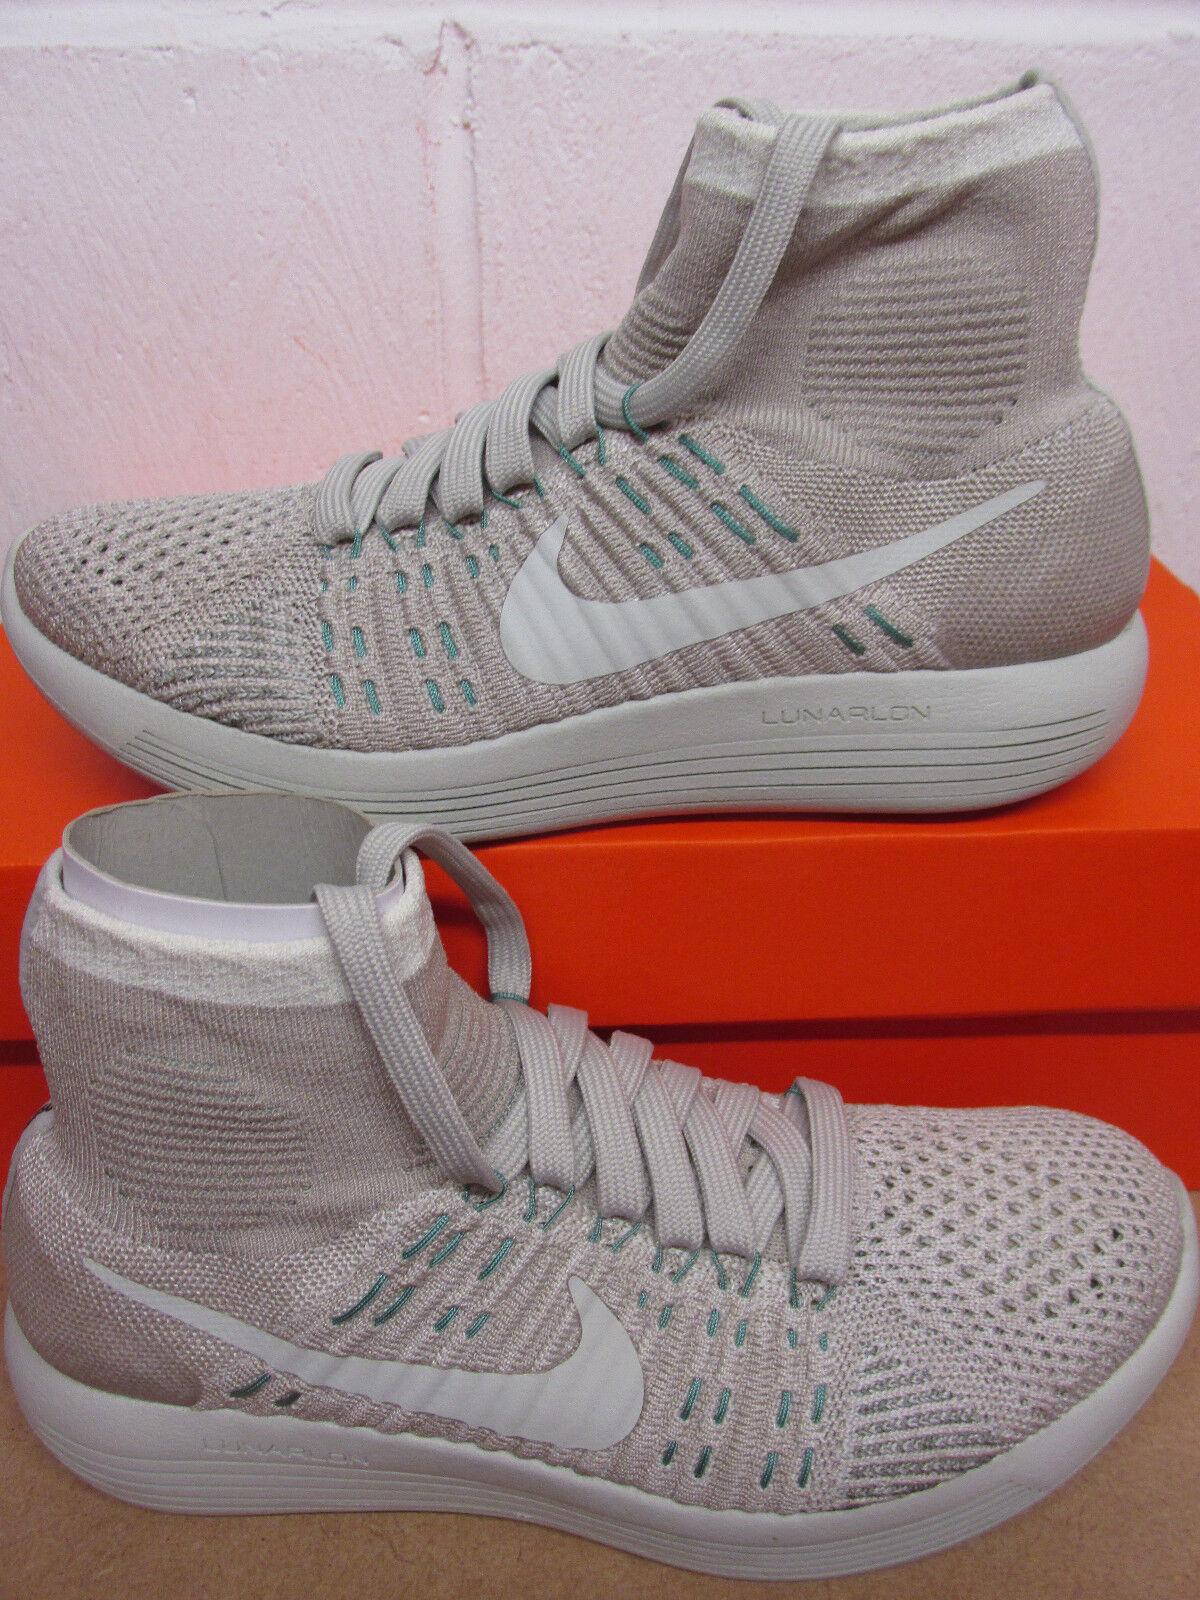 Nike Femme Lunarepic Flyknit Gyakusou Baskets fonctionnement Trainers 823114 100 Baskets Gyakusou bb1558